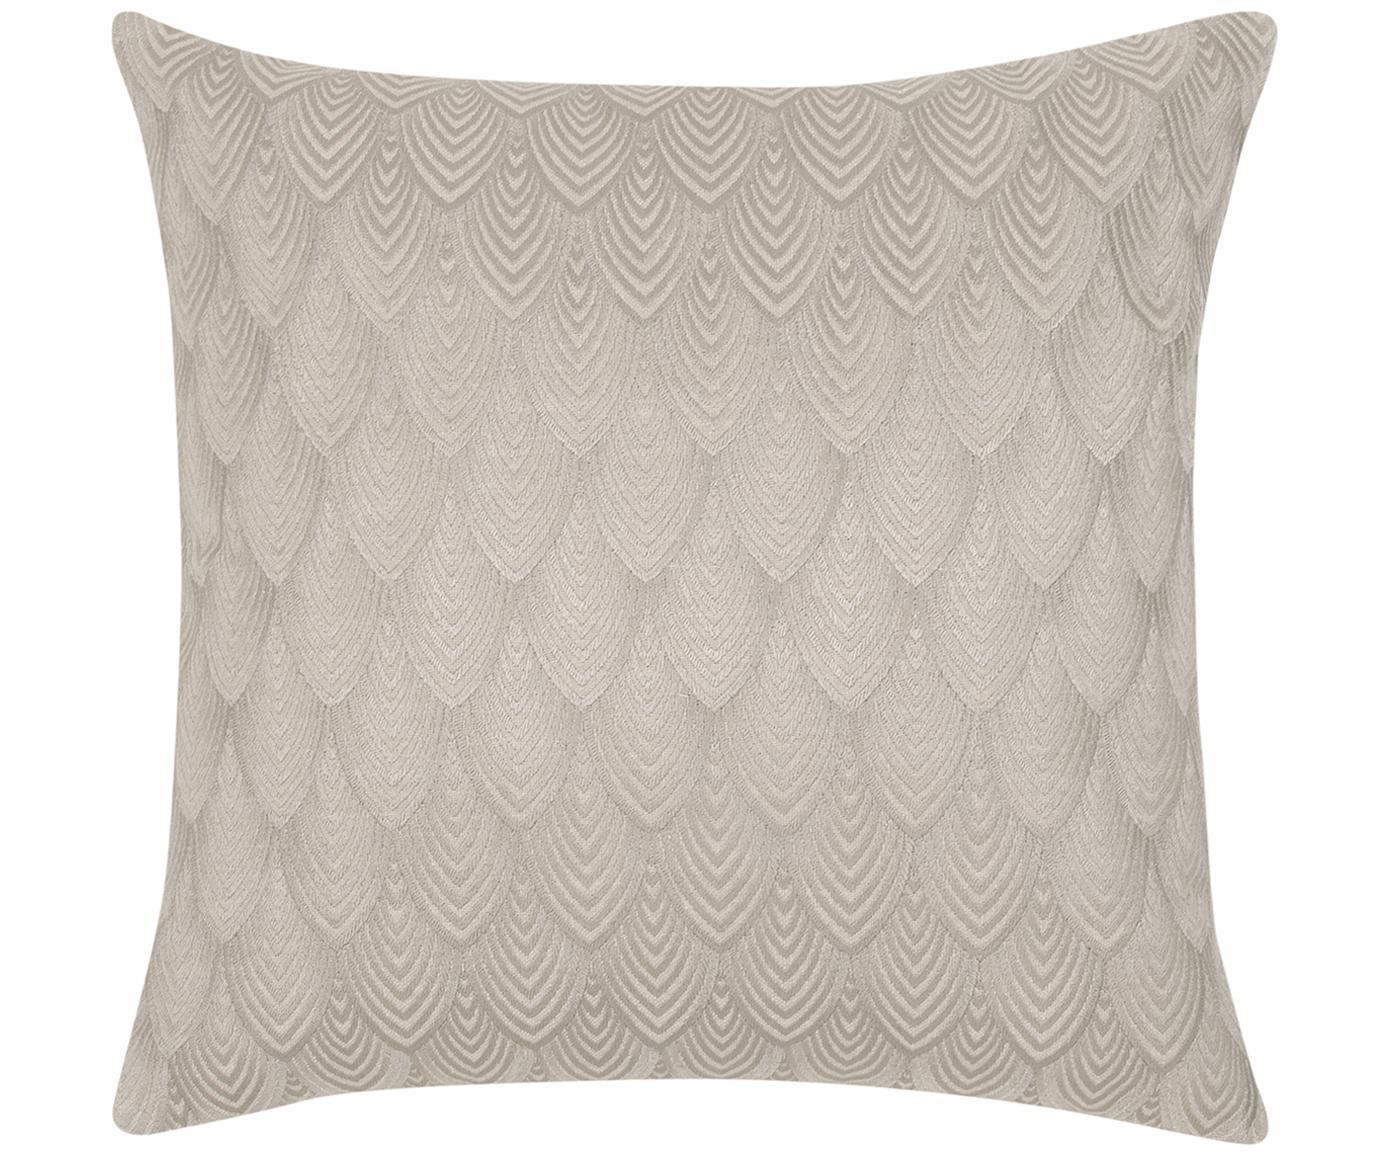 Glänzend bestickte Kissenhülle Giselle, 100% Baumwolle, Taupe-Grau, 45 x 45 cm